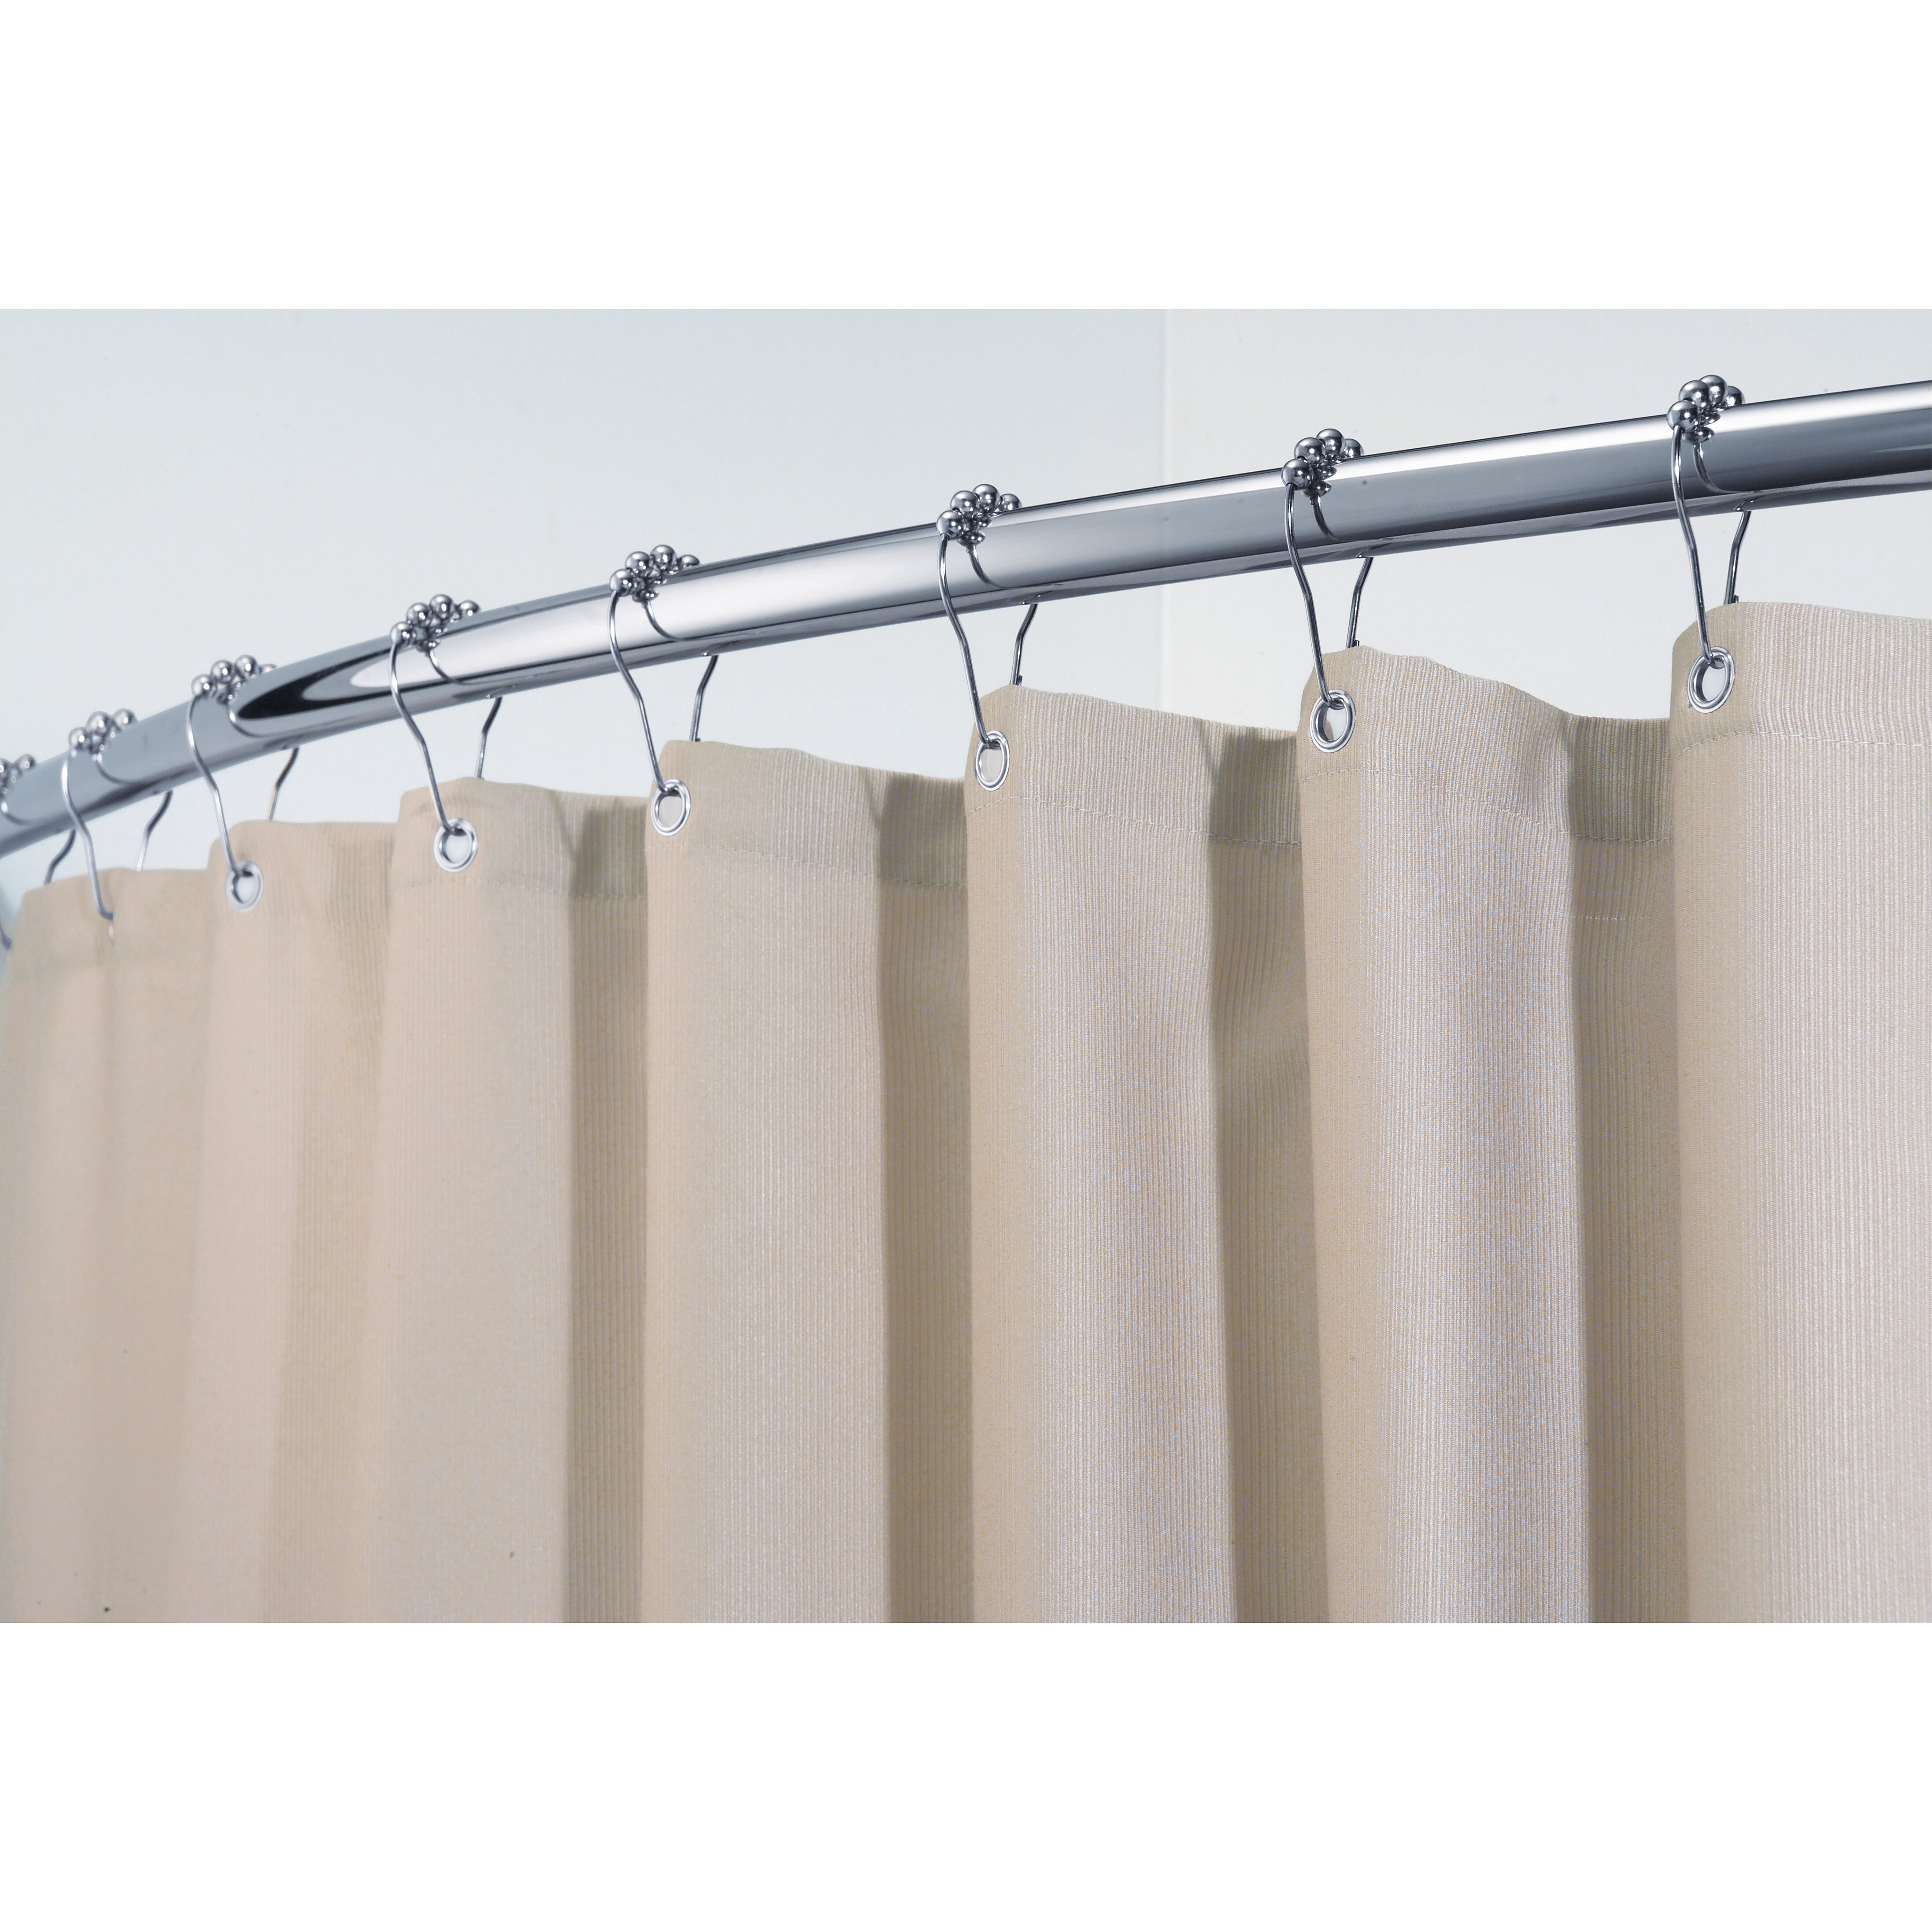 Rhinestone shower curtain hooks - Rhinestone Shower Curtain Hooks Shower Curtain Hooks Interdesign Roller Ring Shower Curtain Hooks